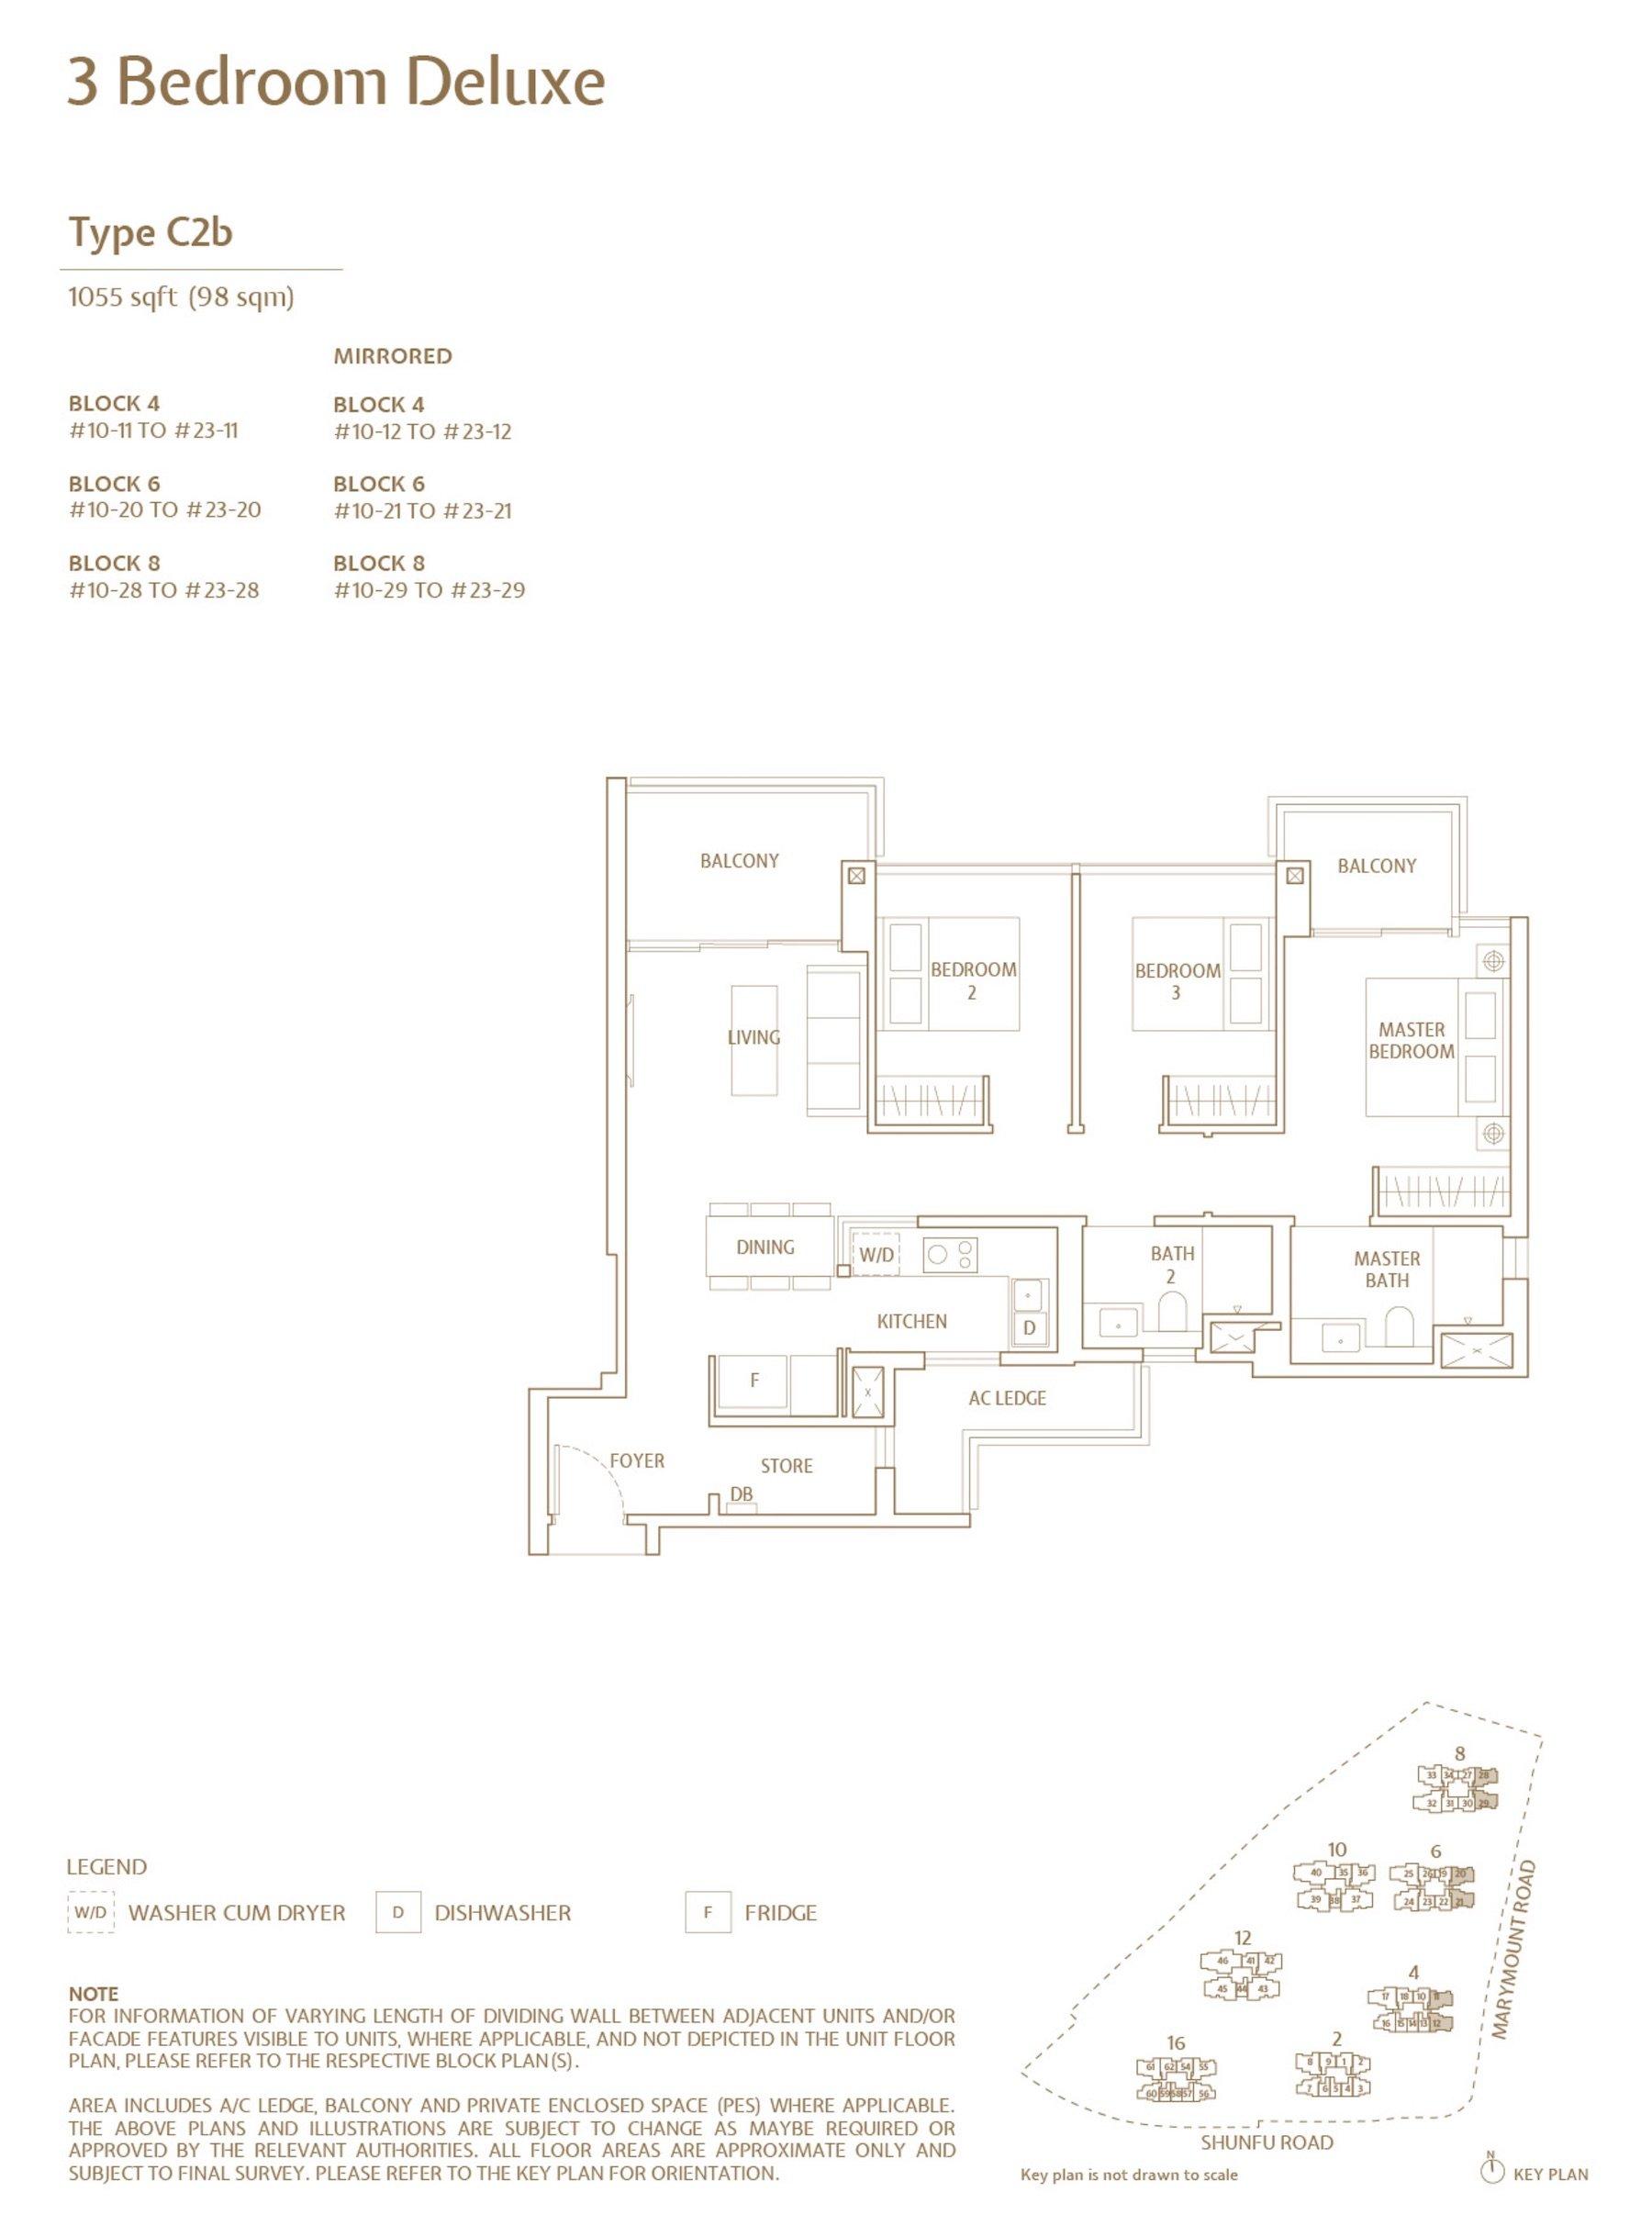 Jadescape 顺福轩 condo 3 bedroom type C2b